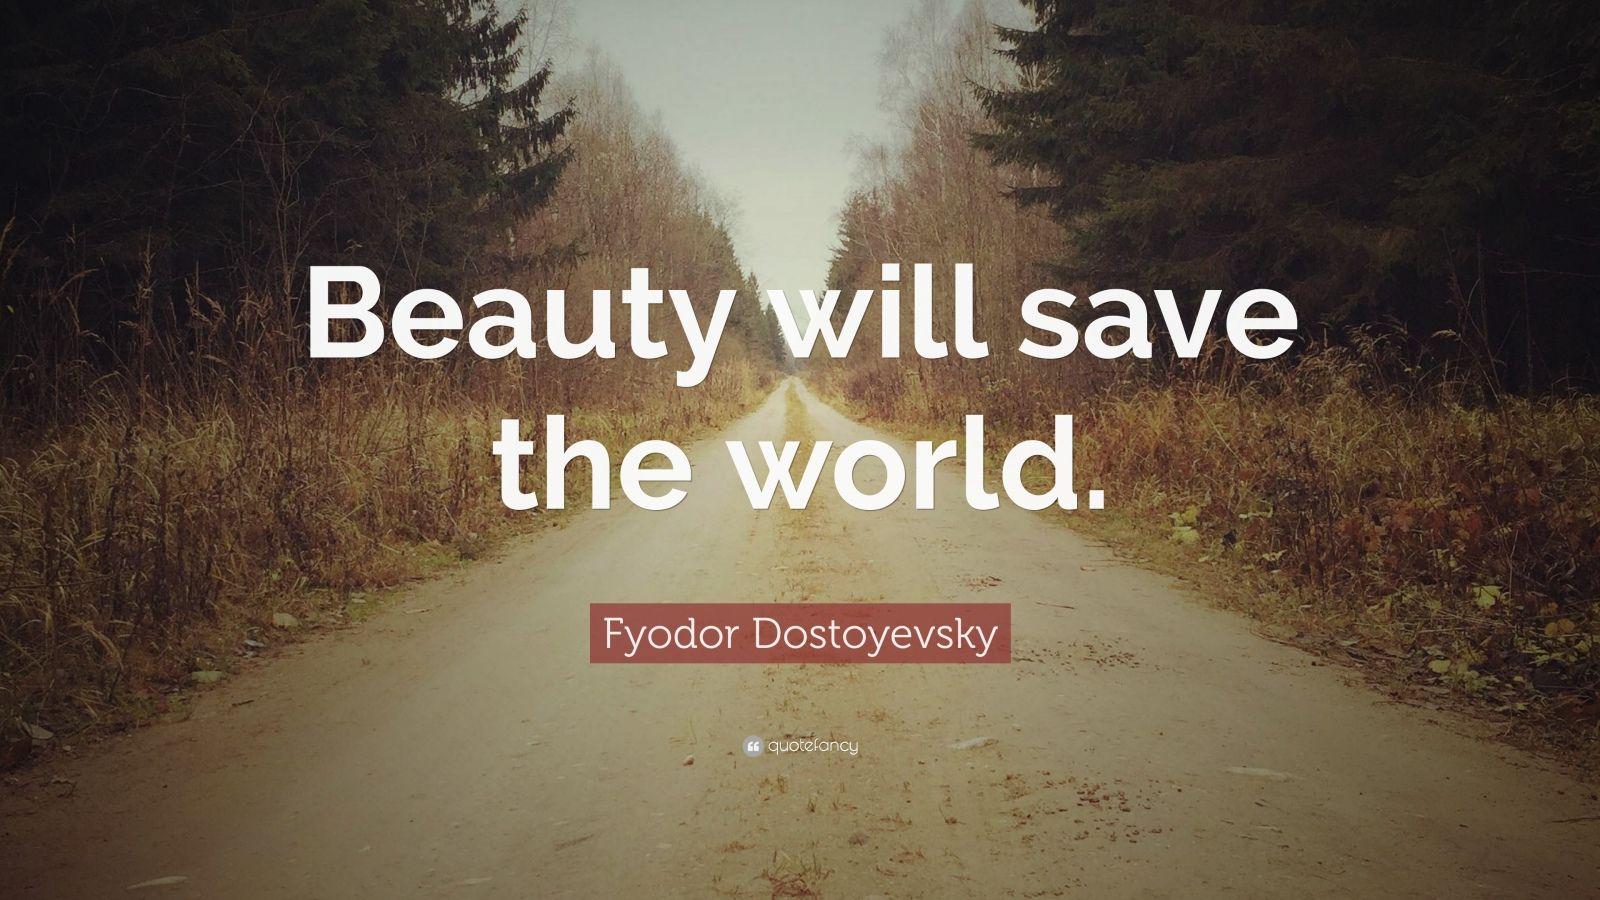 Fyodor Dostoyevsky Quote Beauty Will Save The World Motivation